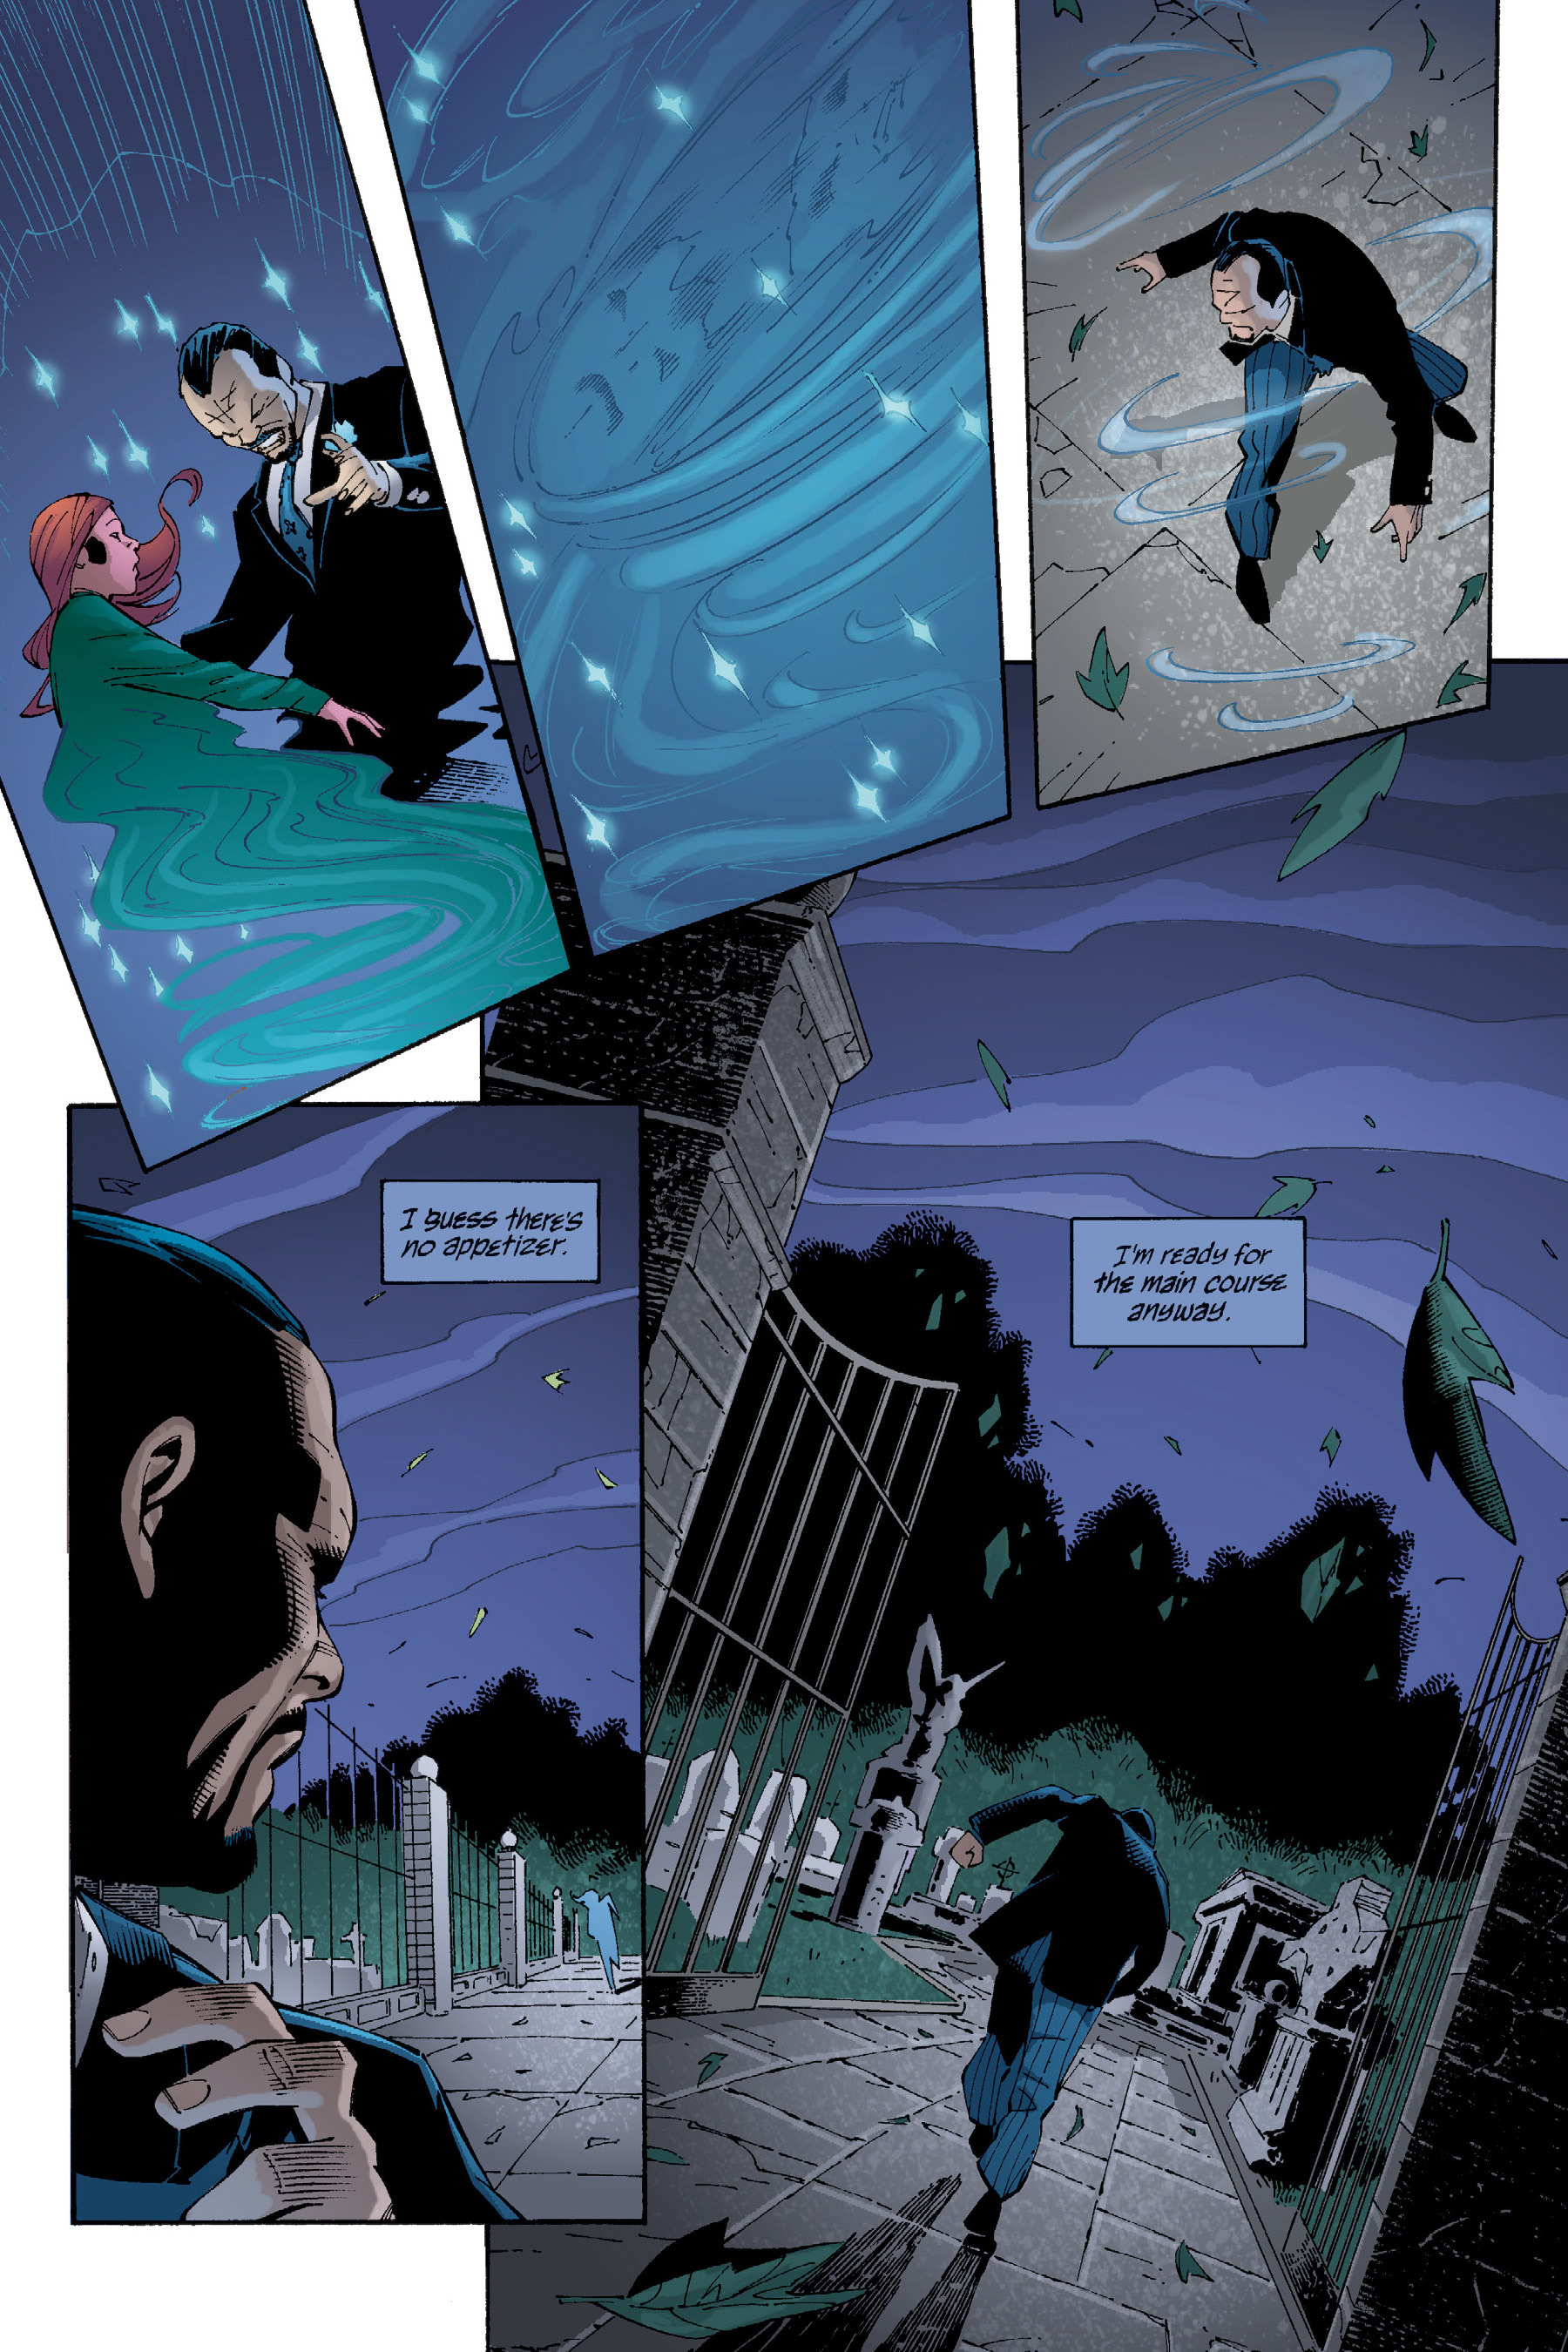 Read online Buffy the Vampire Slayer: Omnibus comic -  Issue # TPB 5 - 70